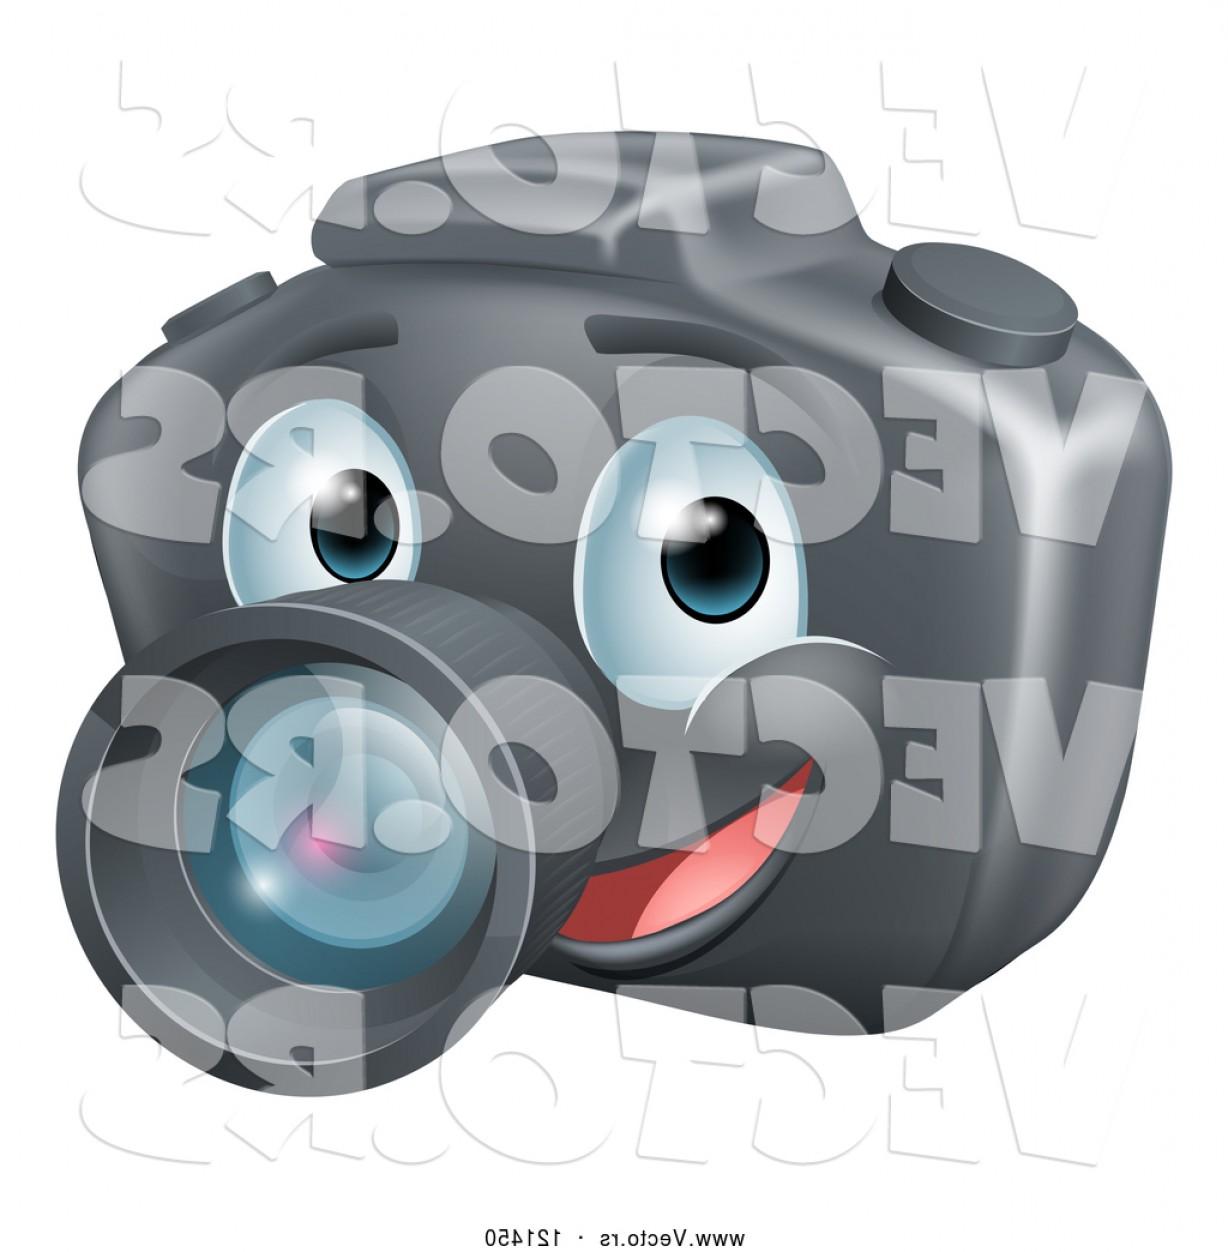 1228x1252 Vector Of Cartoon Smiling Happy Dslr Camera Mascot By